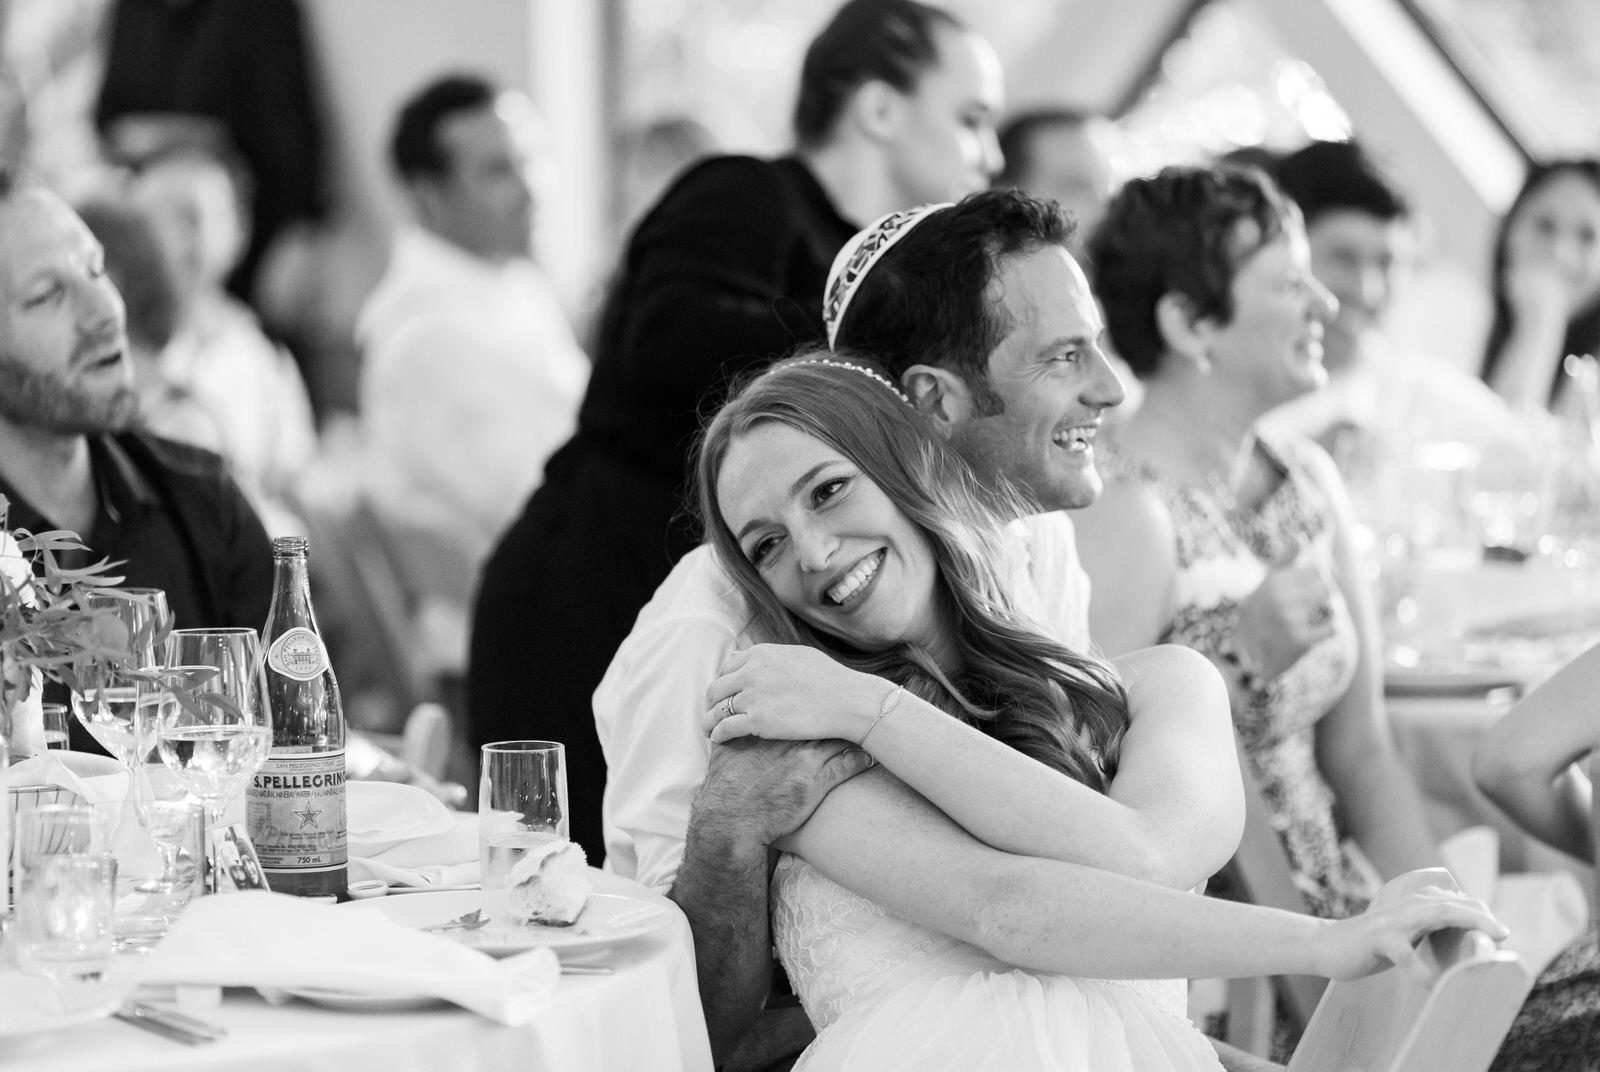 Sunshine Coast and Vancouver Wedding Photographer - Jennifer Picard - West Coast Weddings298.jpg